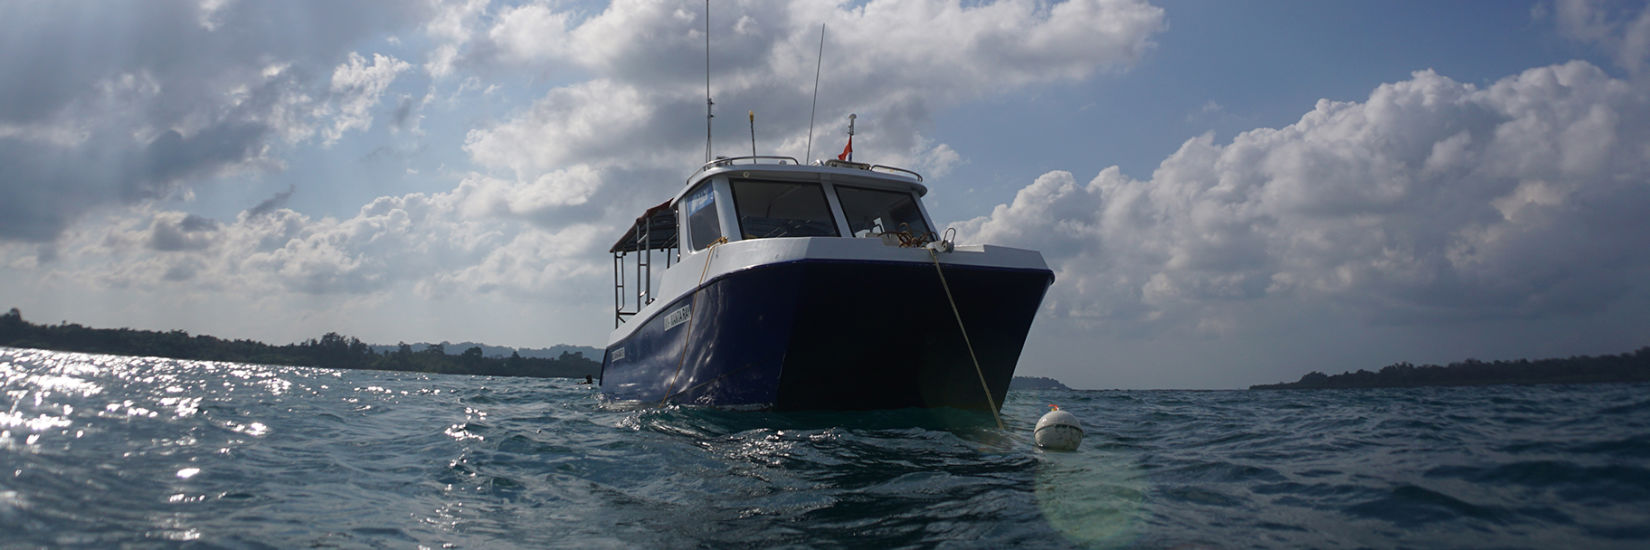 Fun diving 01 image